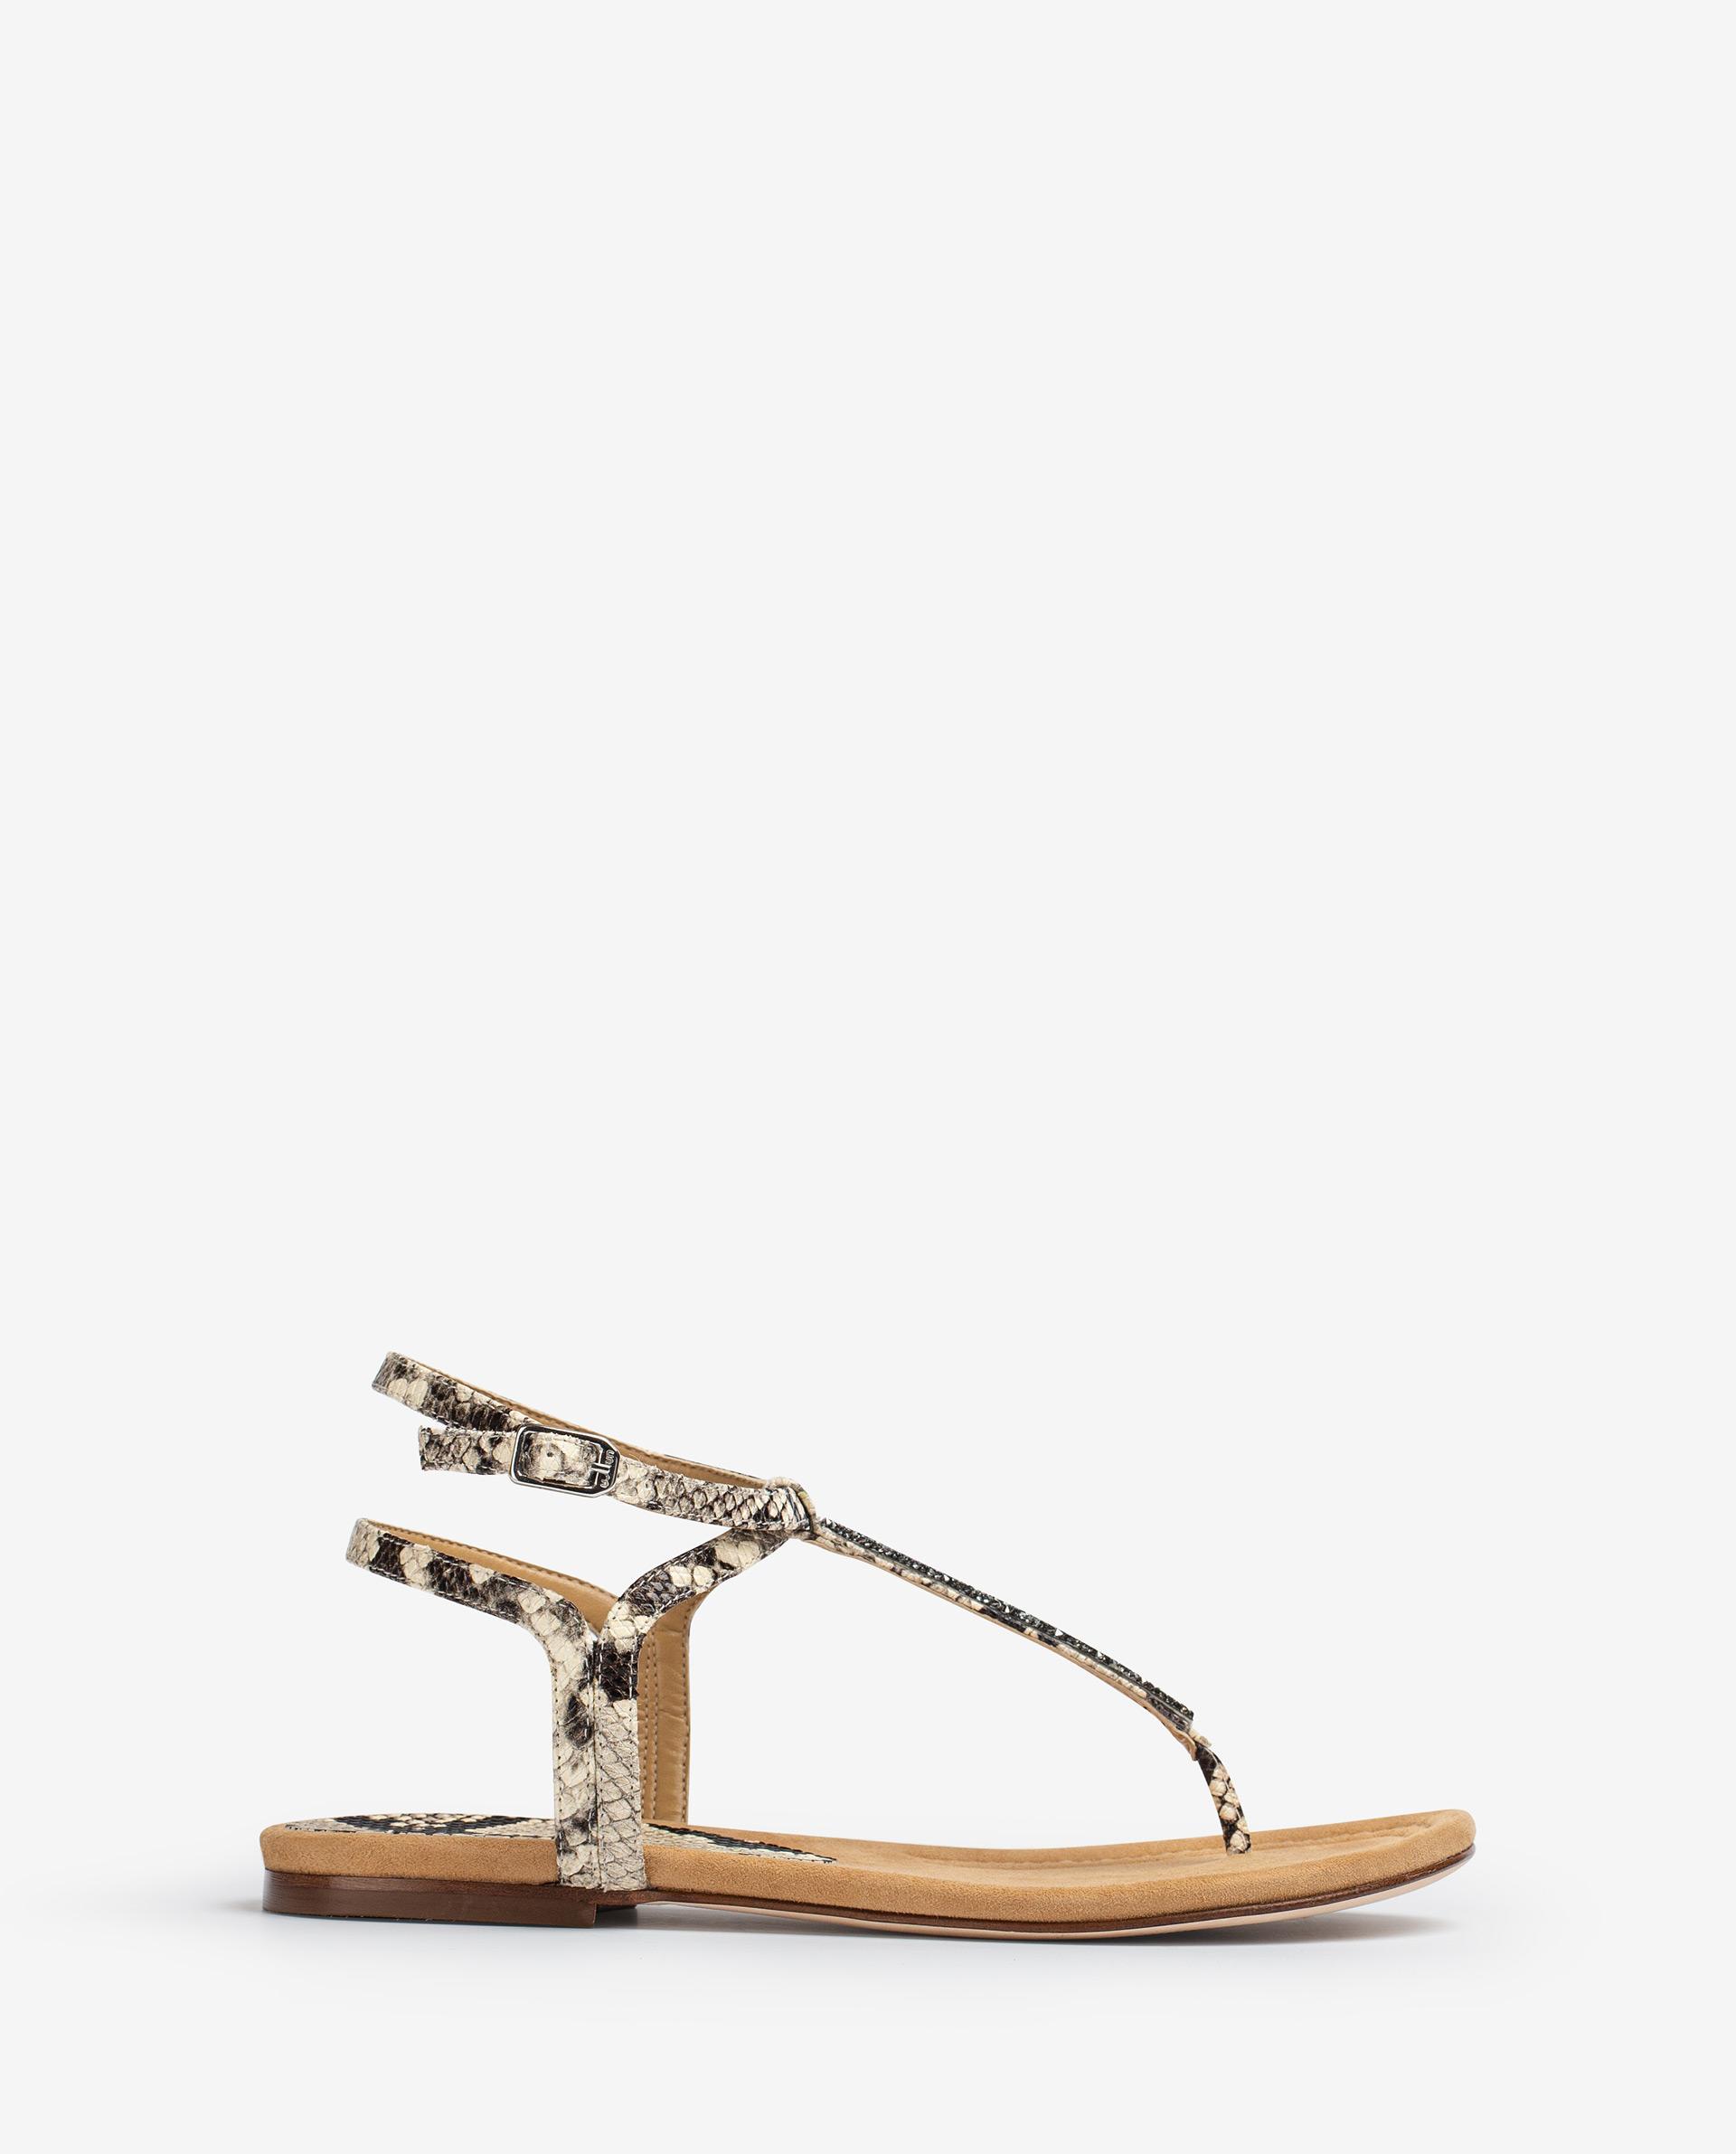 UNISA Flat Swarovski and snake effect leather thong sandals CHARLE_21_VIP 2